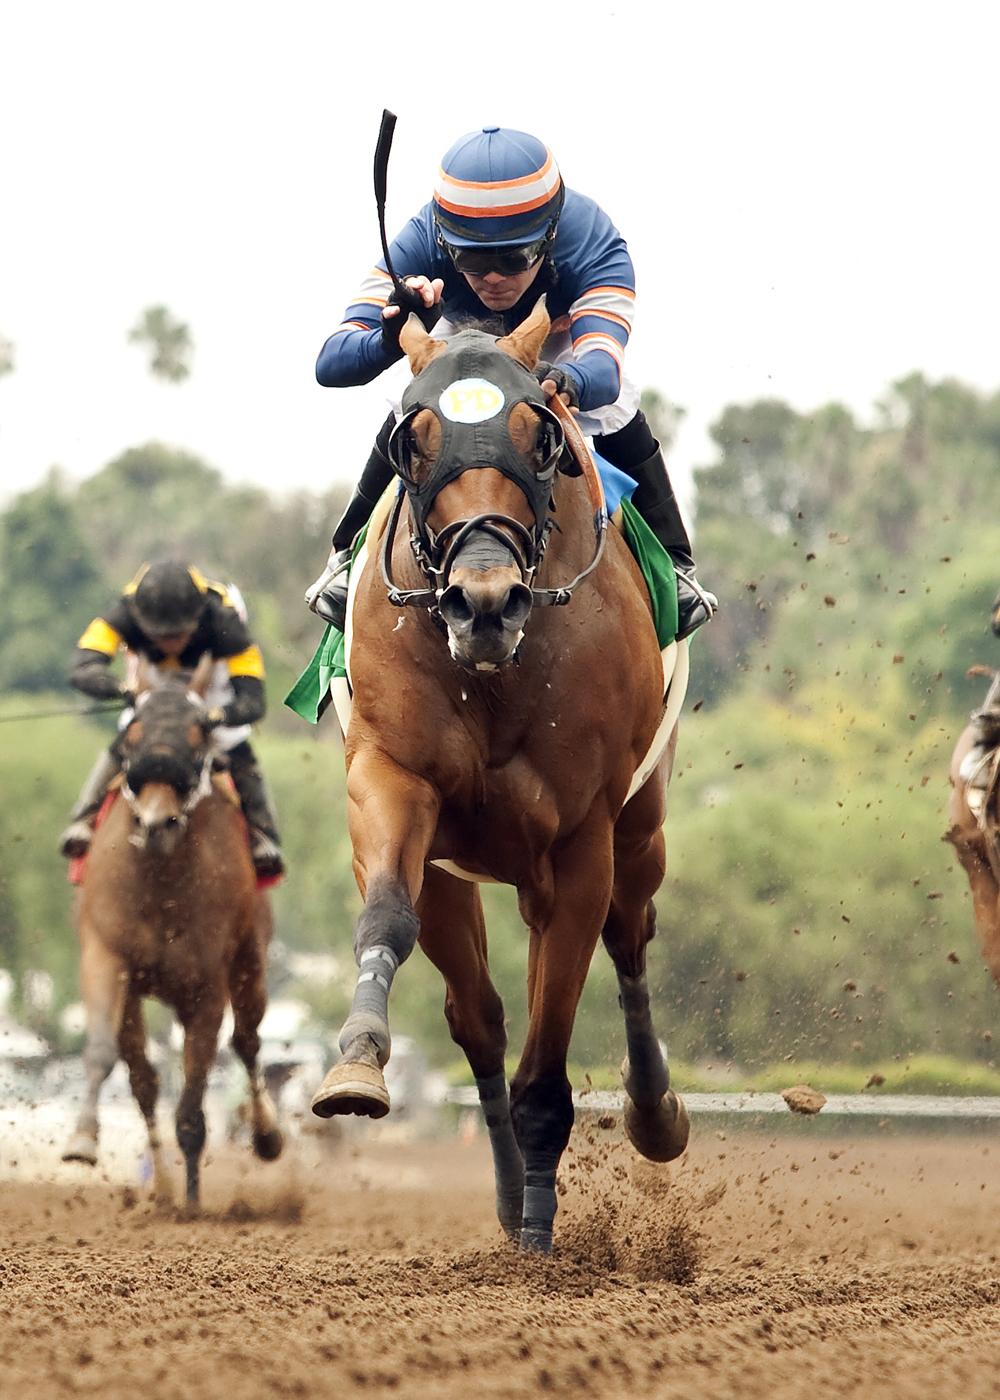 In a photo provided by Benoit Photo, Sunday Rules and jockey Tyler Baze win the $150,000 Spring Fever Stakes horse race, Saturday, May 23, 2015 ,at Santa Anita in Arcadia, Calif. (Benoit Photo via AP)